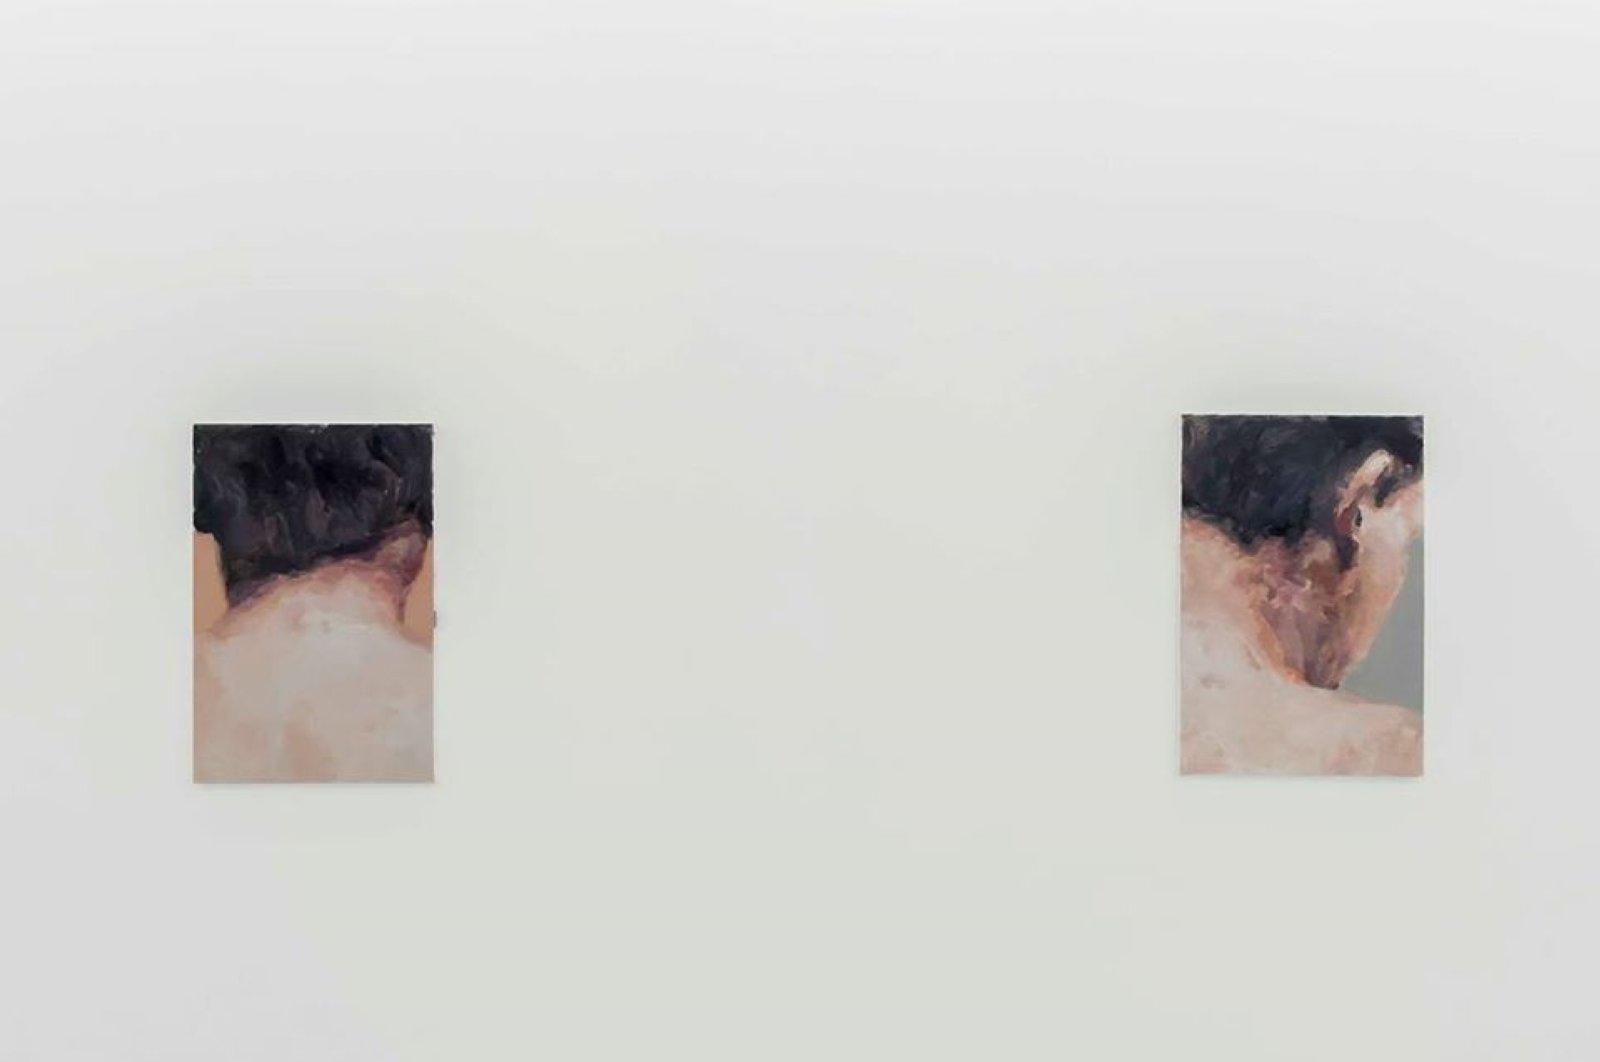 The paintings depicting merging parts of the body by Berke Doğanoğlu.